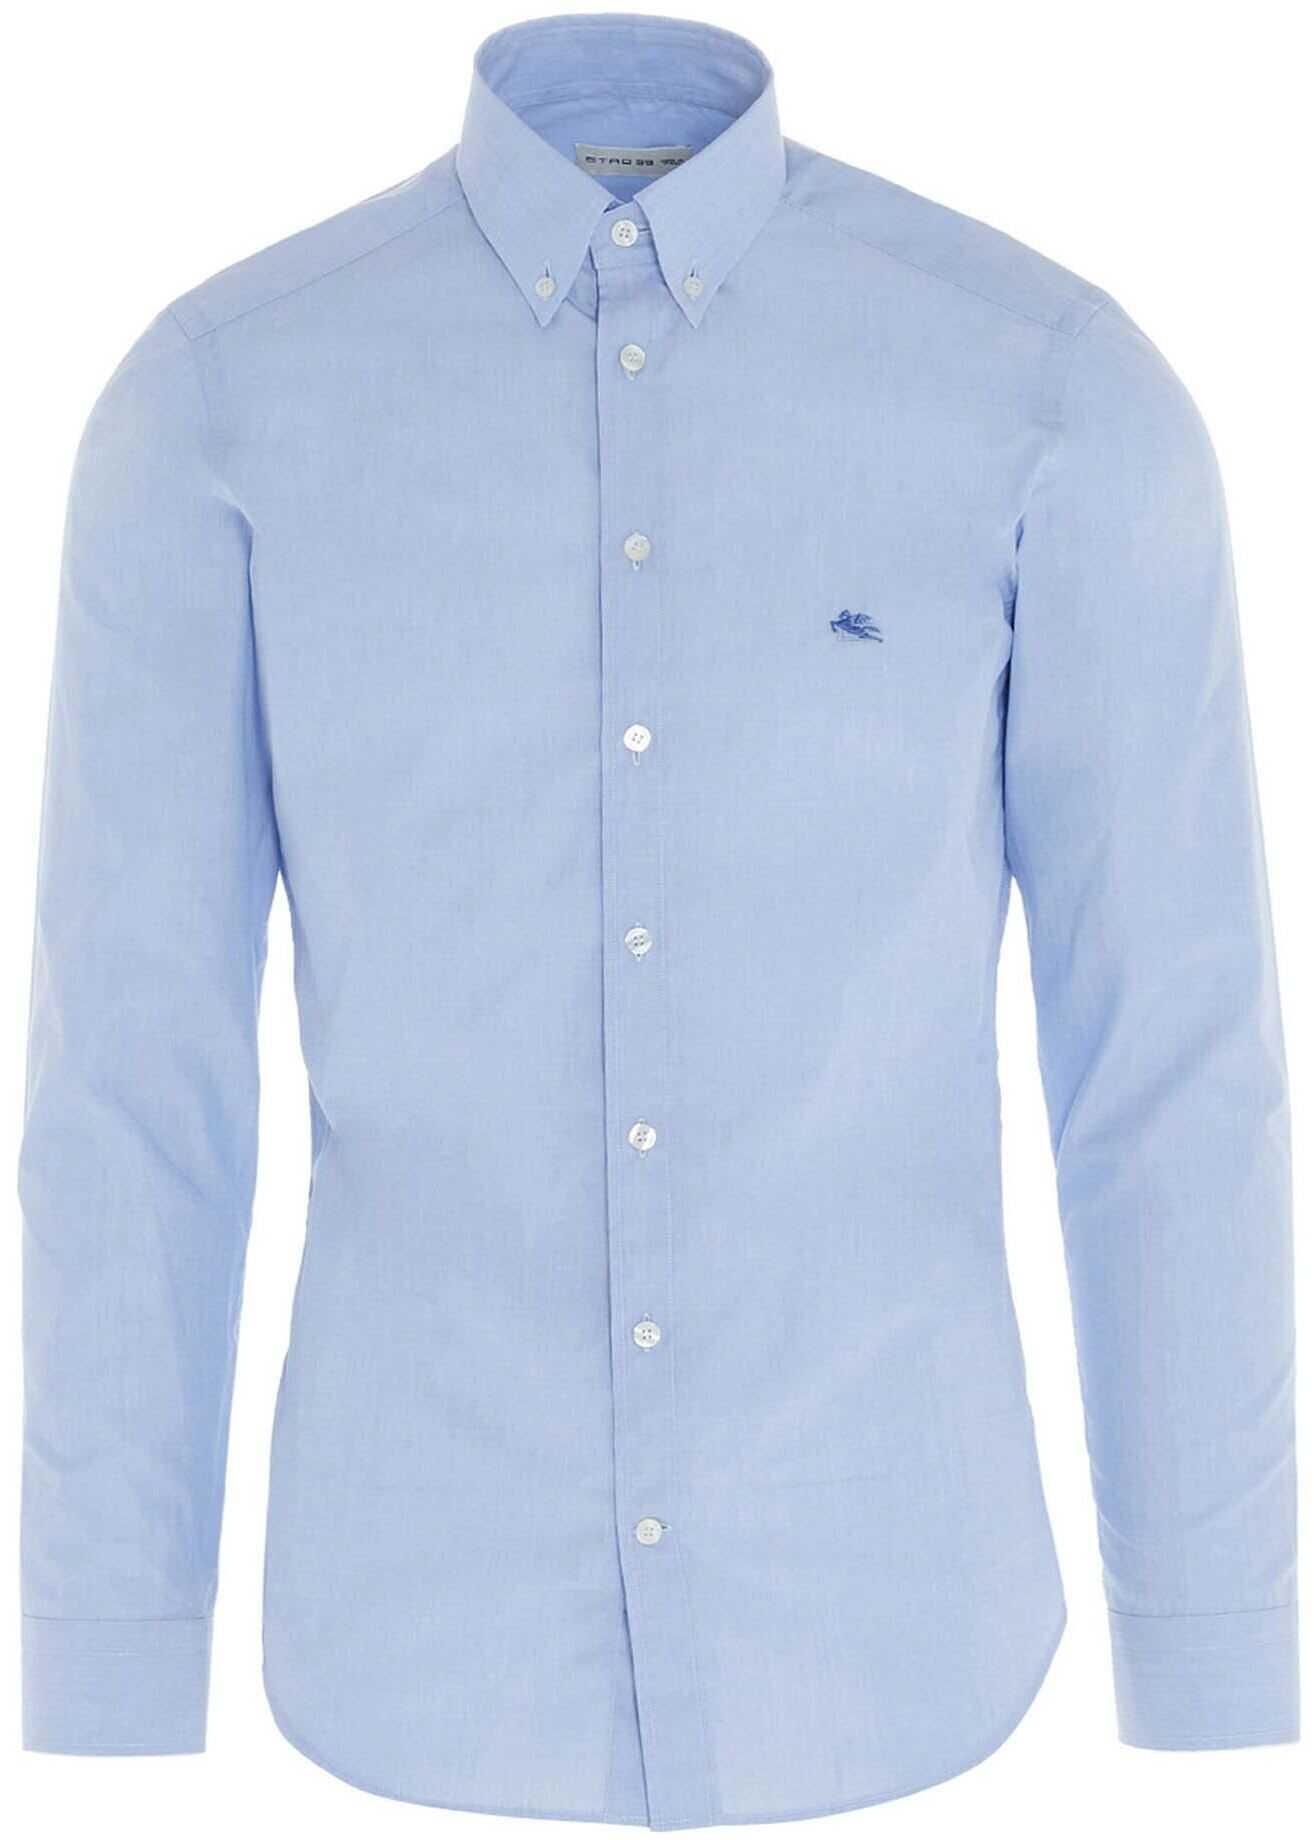 ETRO Logo Embroidered Shirt In Light Blue Light Blue imagine